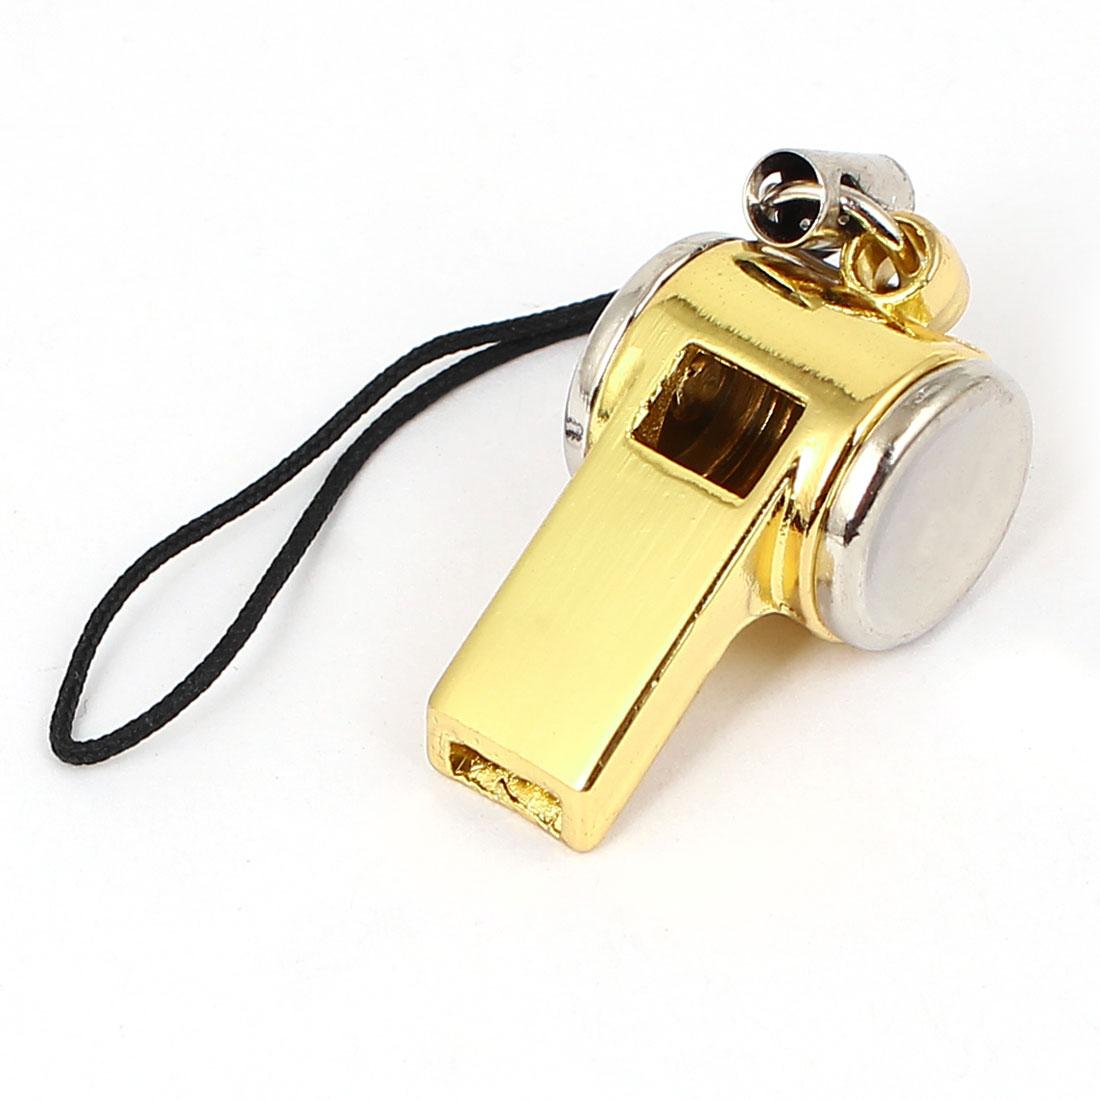 Metal Whistle Pendant Nylon String Handbag Purse Cell Phone Strap Gold Tone